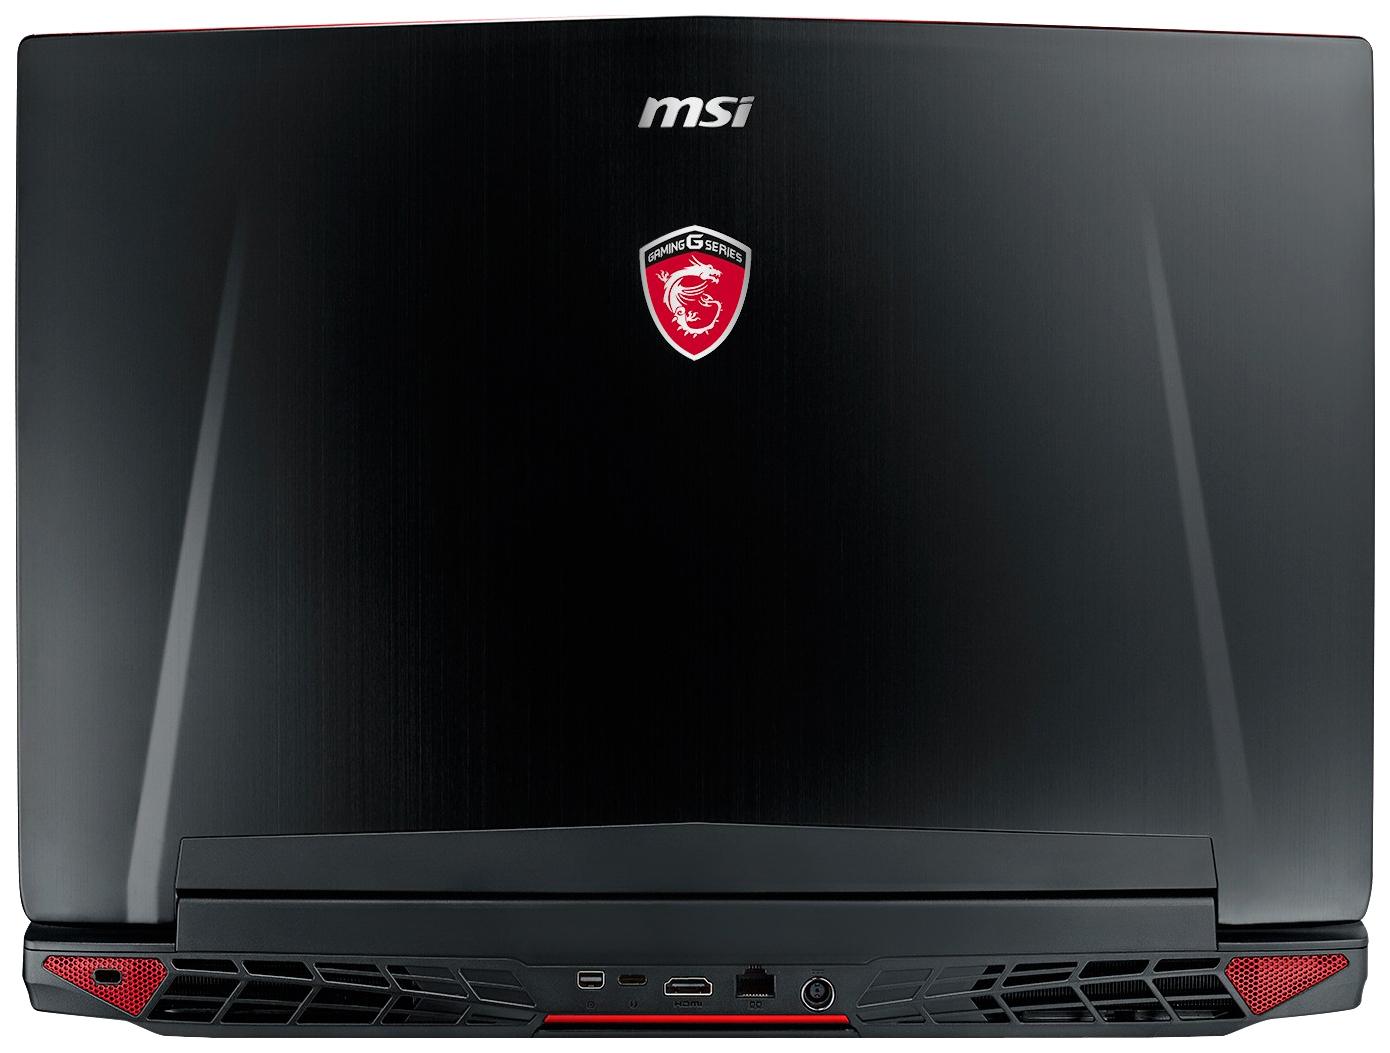 Ноутбук MSI GT72S 6QE-1043RU Dominator Pro 4K 9S7-178211-1043